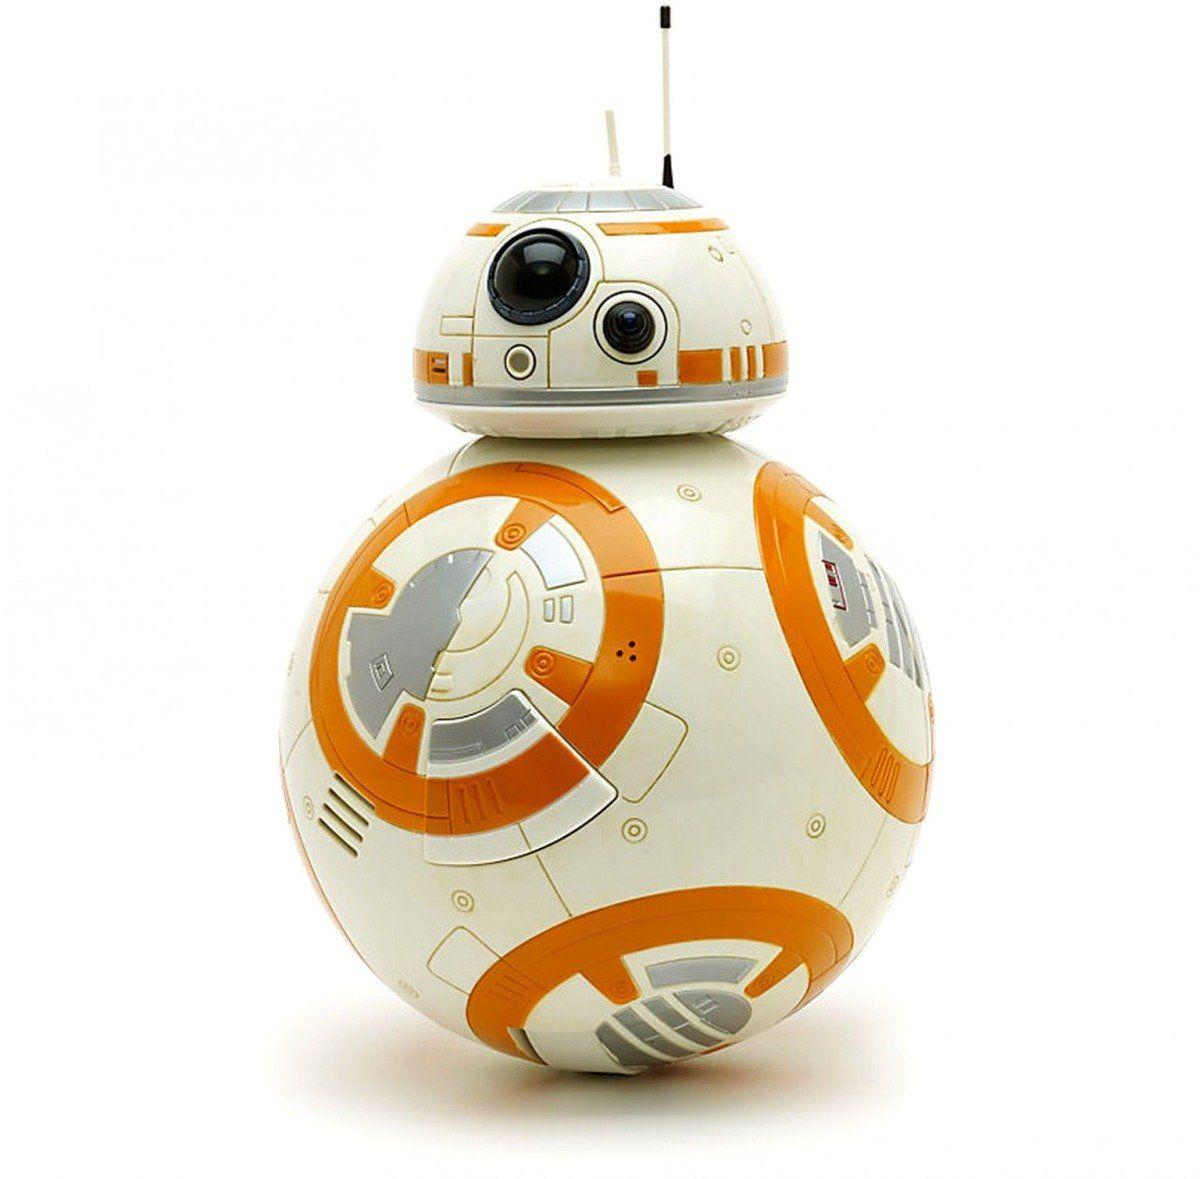 Boneco BB-8 (12 Cm): Star Wars Despertar da Força Ep 7 (The Force Awekens) - Hasbro